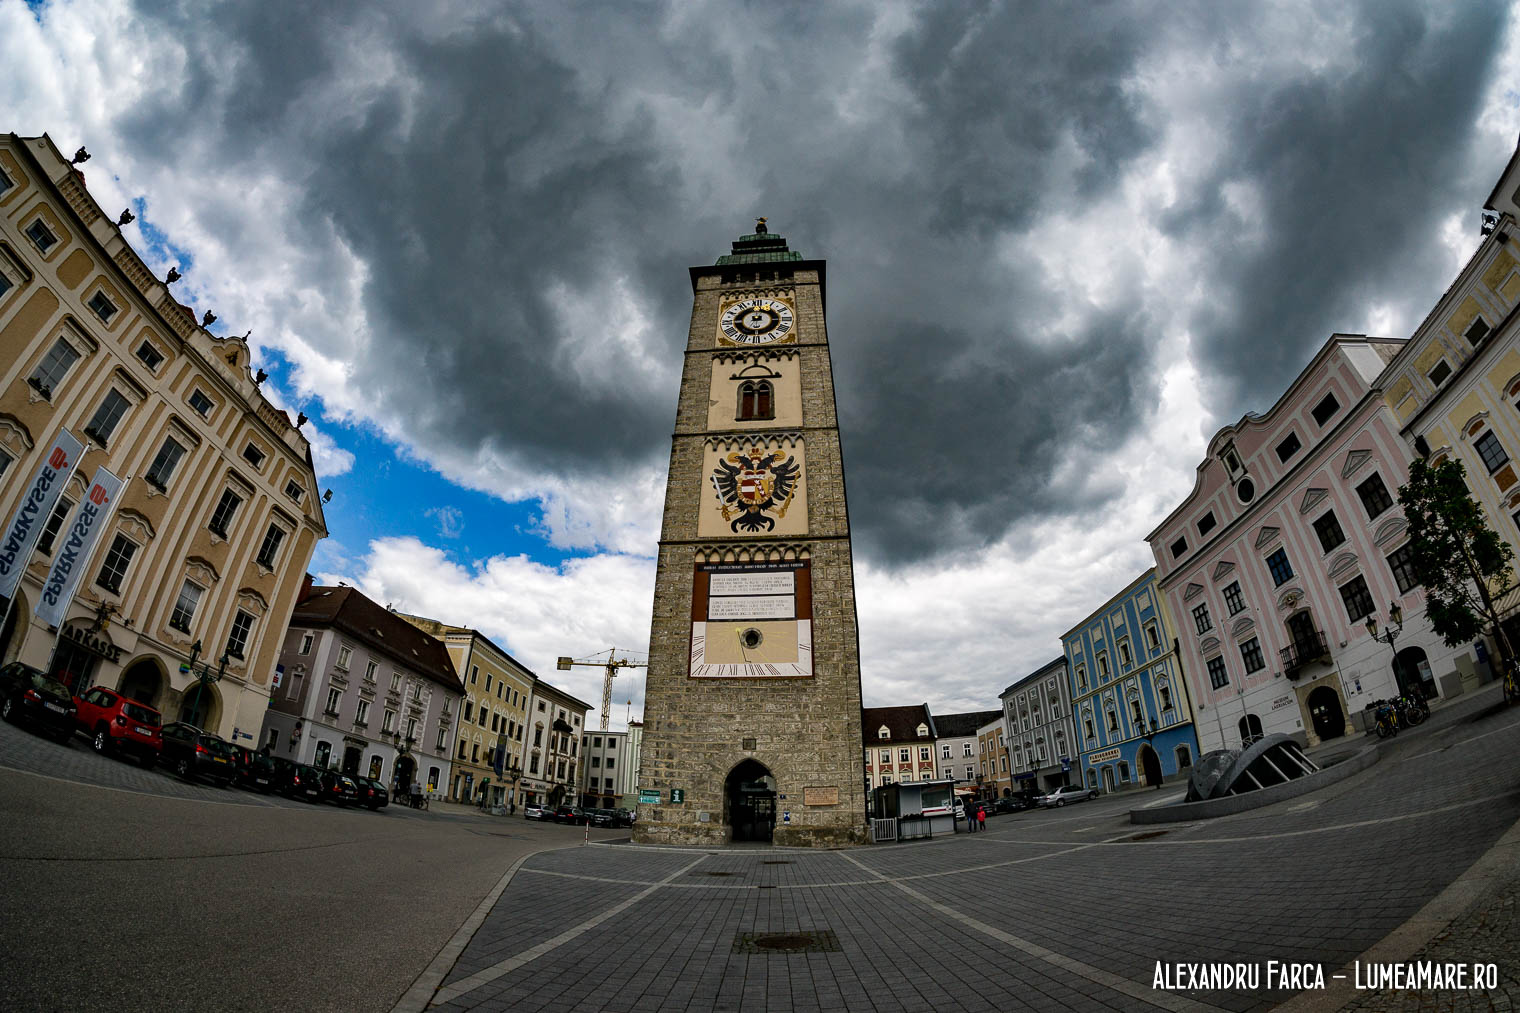 Turnul din Enns